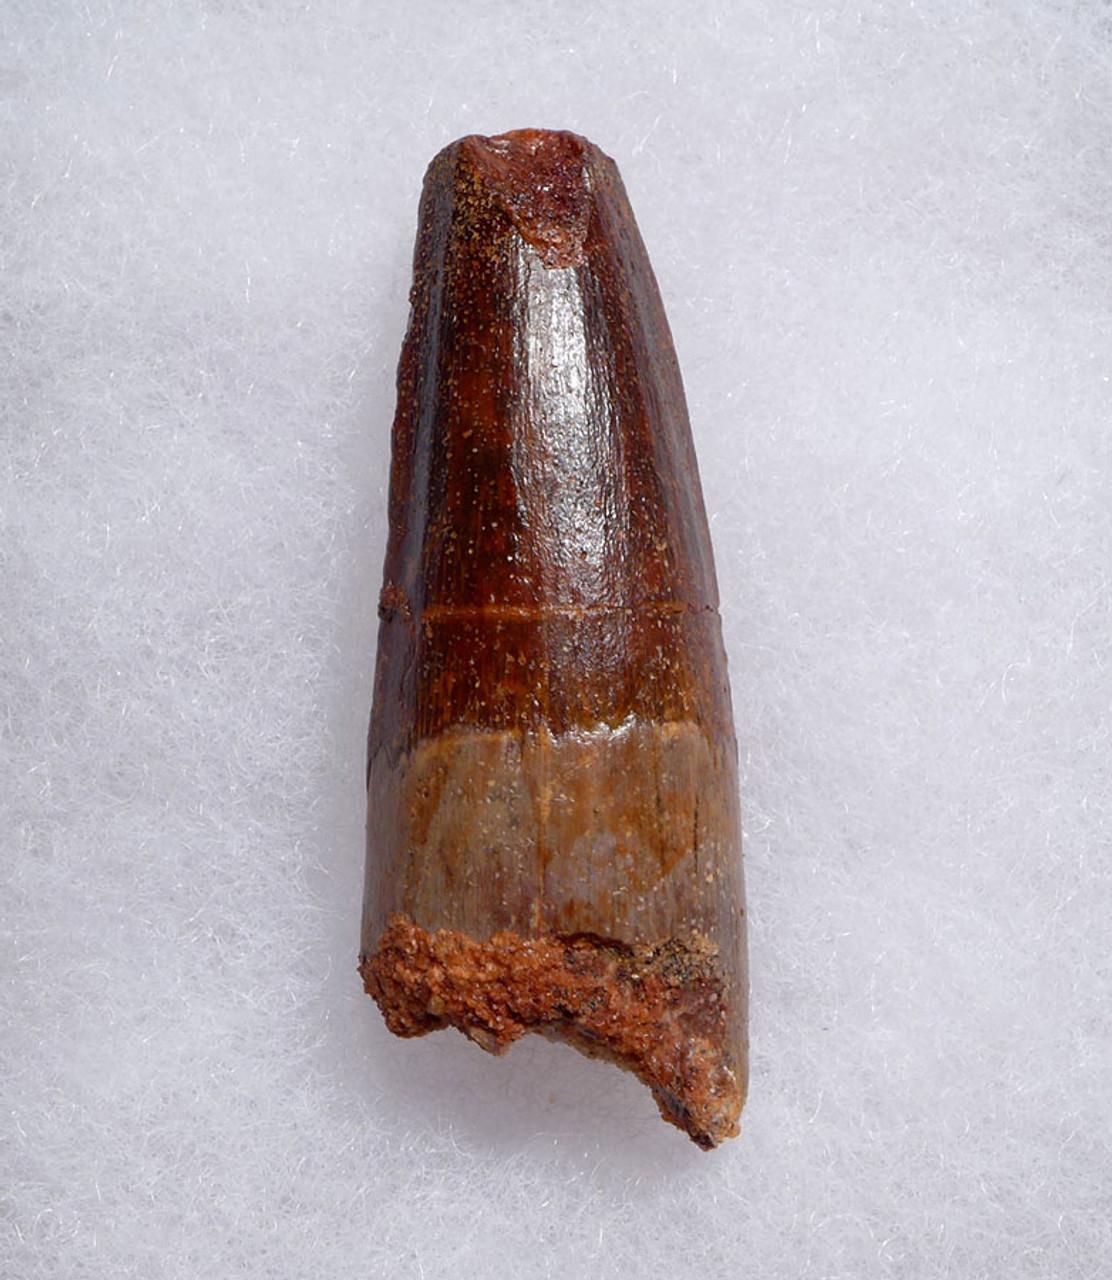 UNBROKEN 2 INCH SPINOSAURUS DINOSAUR FOSSIL TOOTH WITH BEAUTIFUL ENAMEL *DT5-467